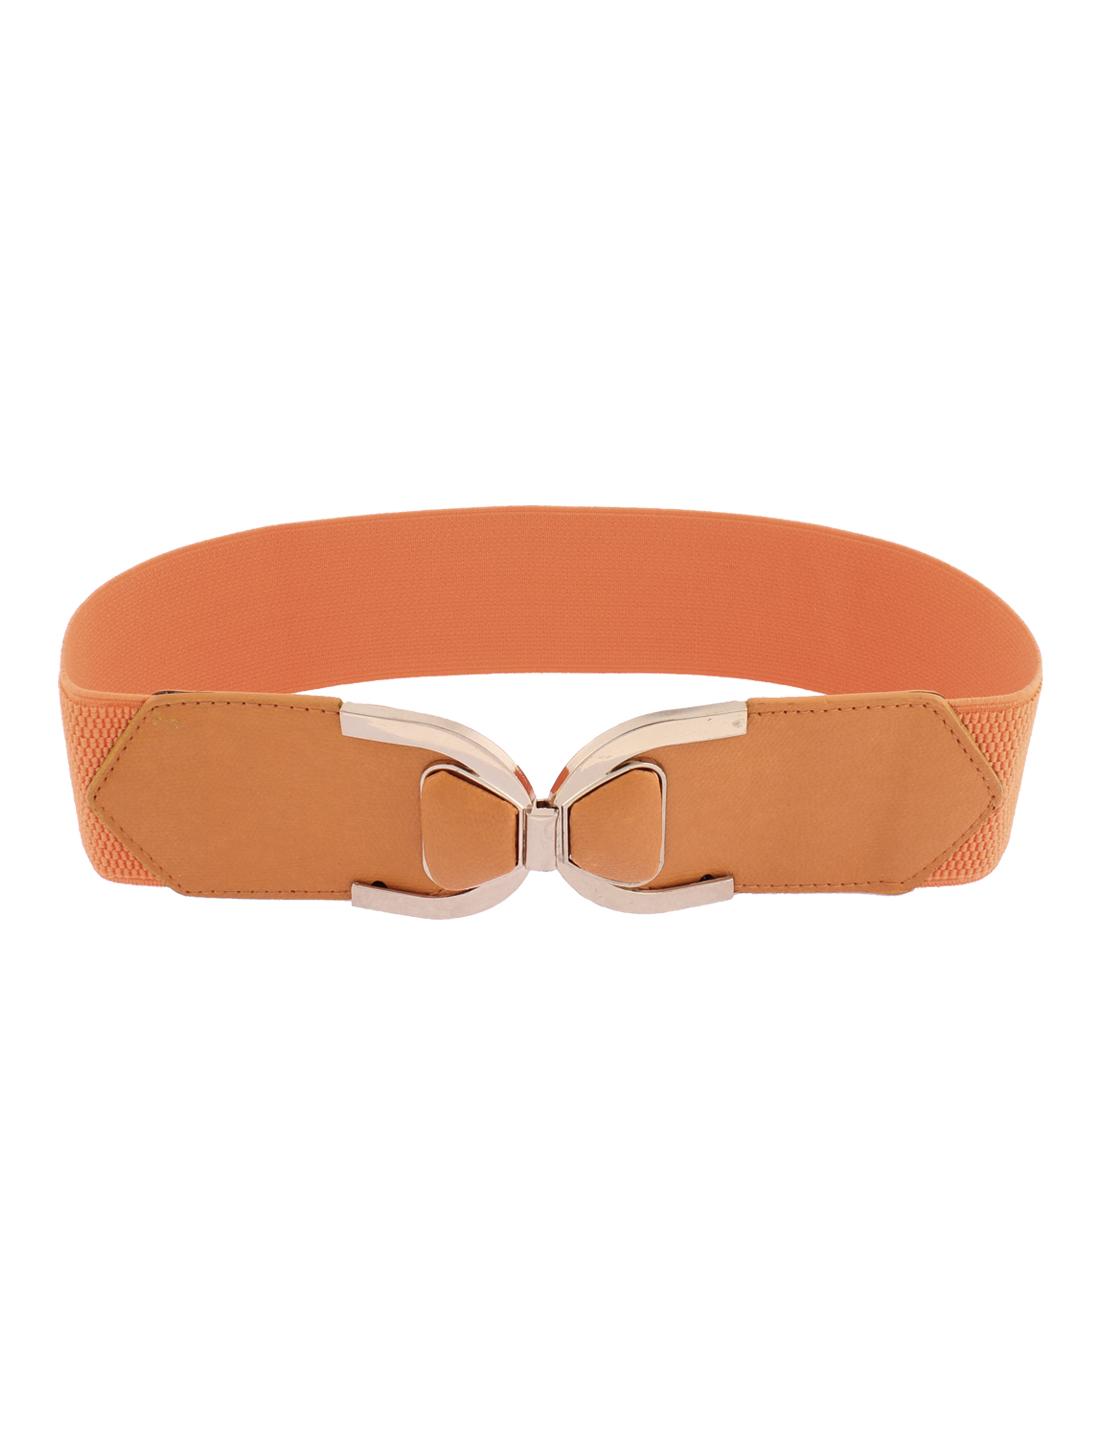 Gold Tone Buckle Wide Stretch Elastic Waist Belt Waistband for Women